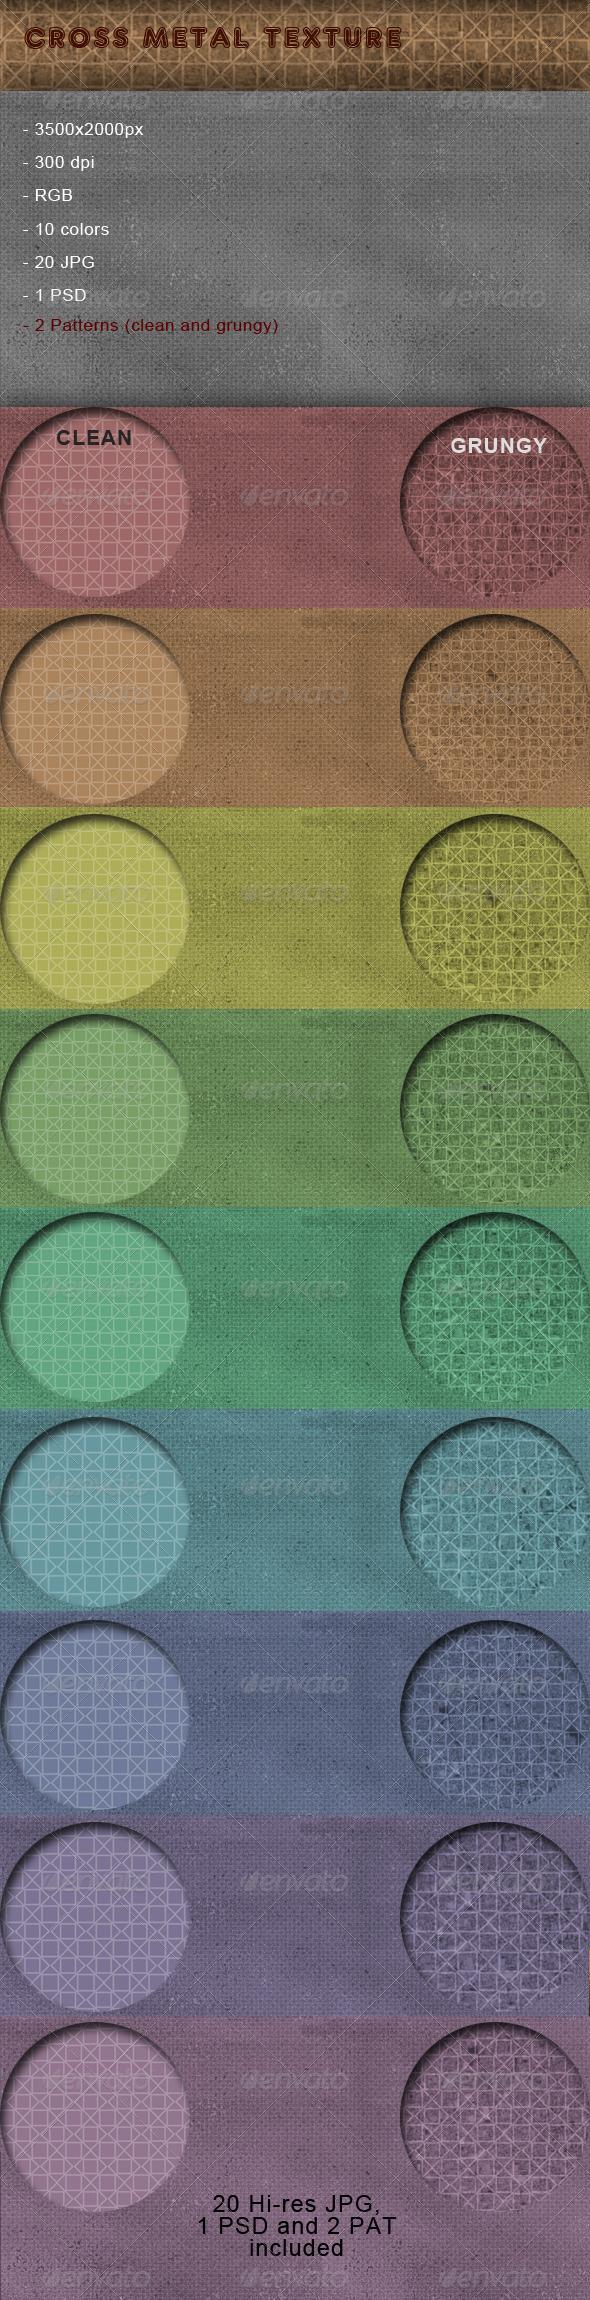 Cross Metal Texture - Patterns Backgrounds